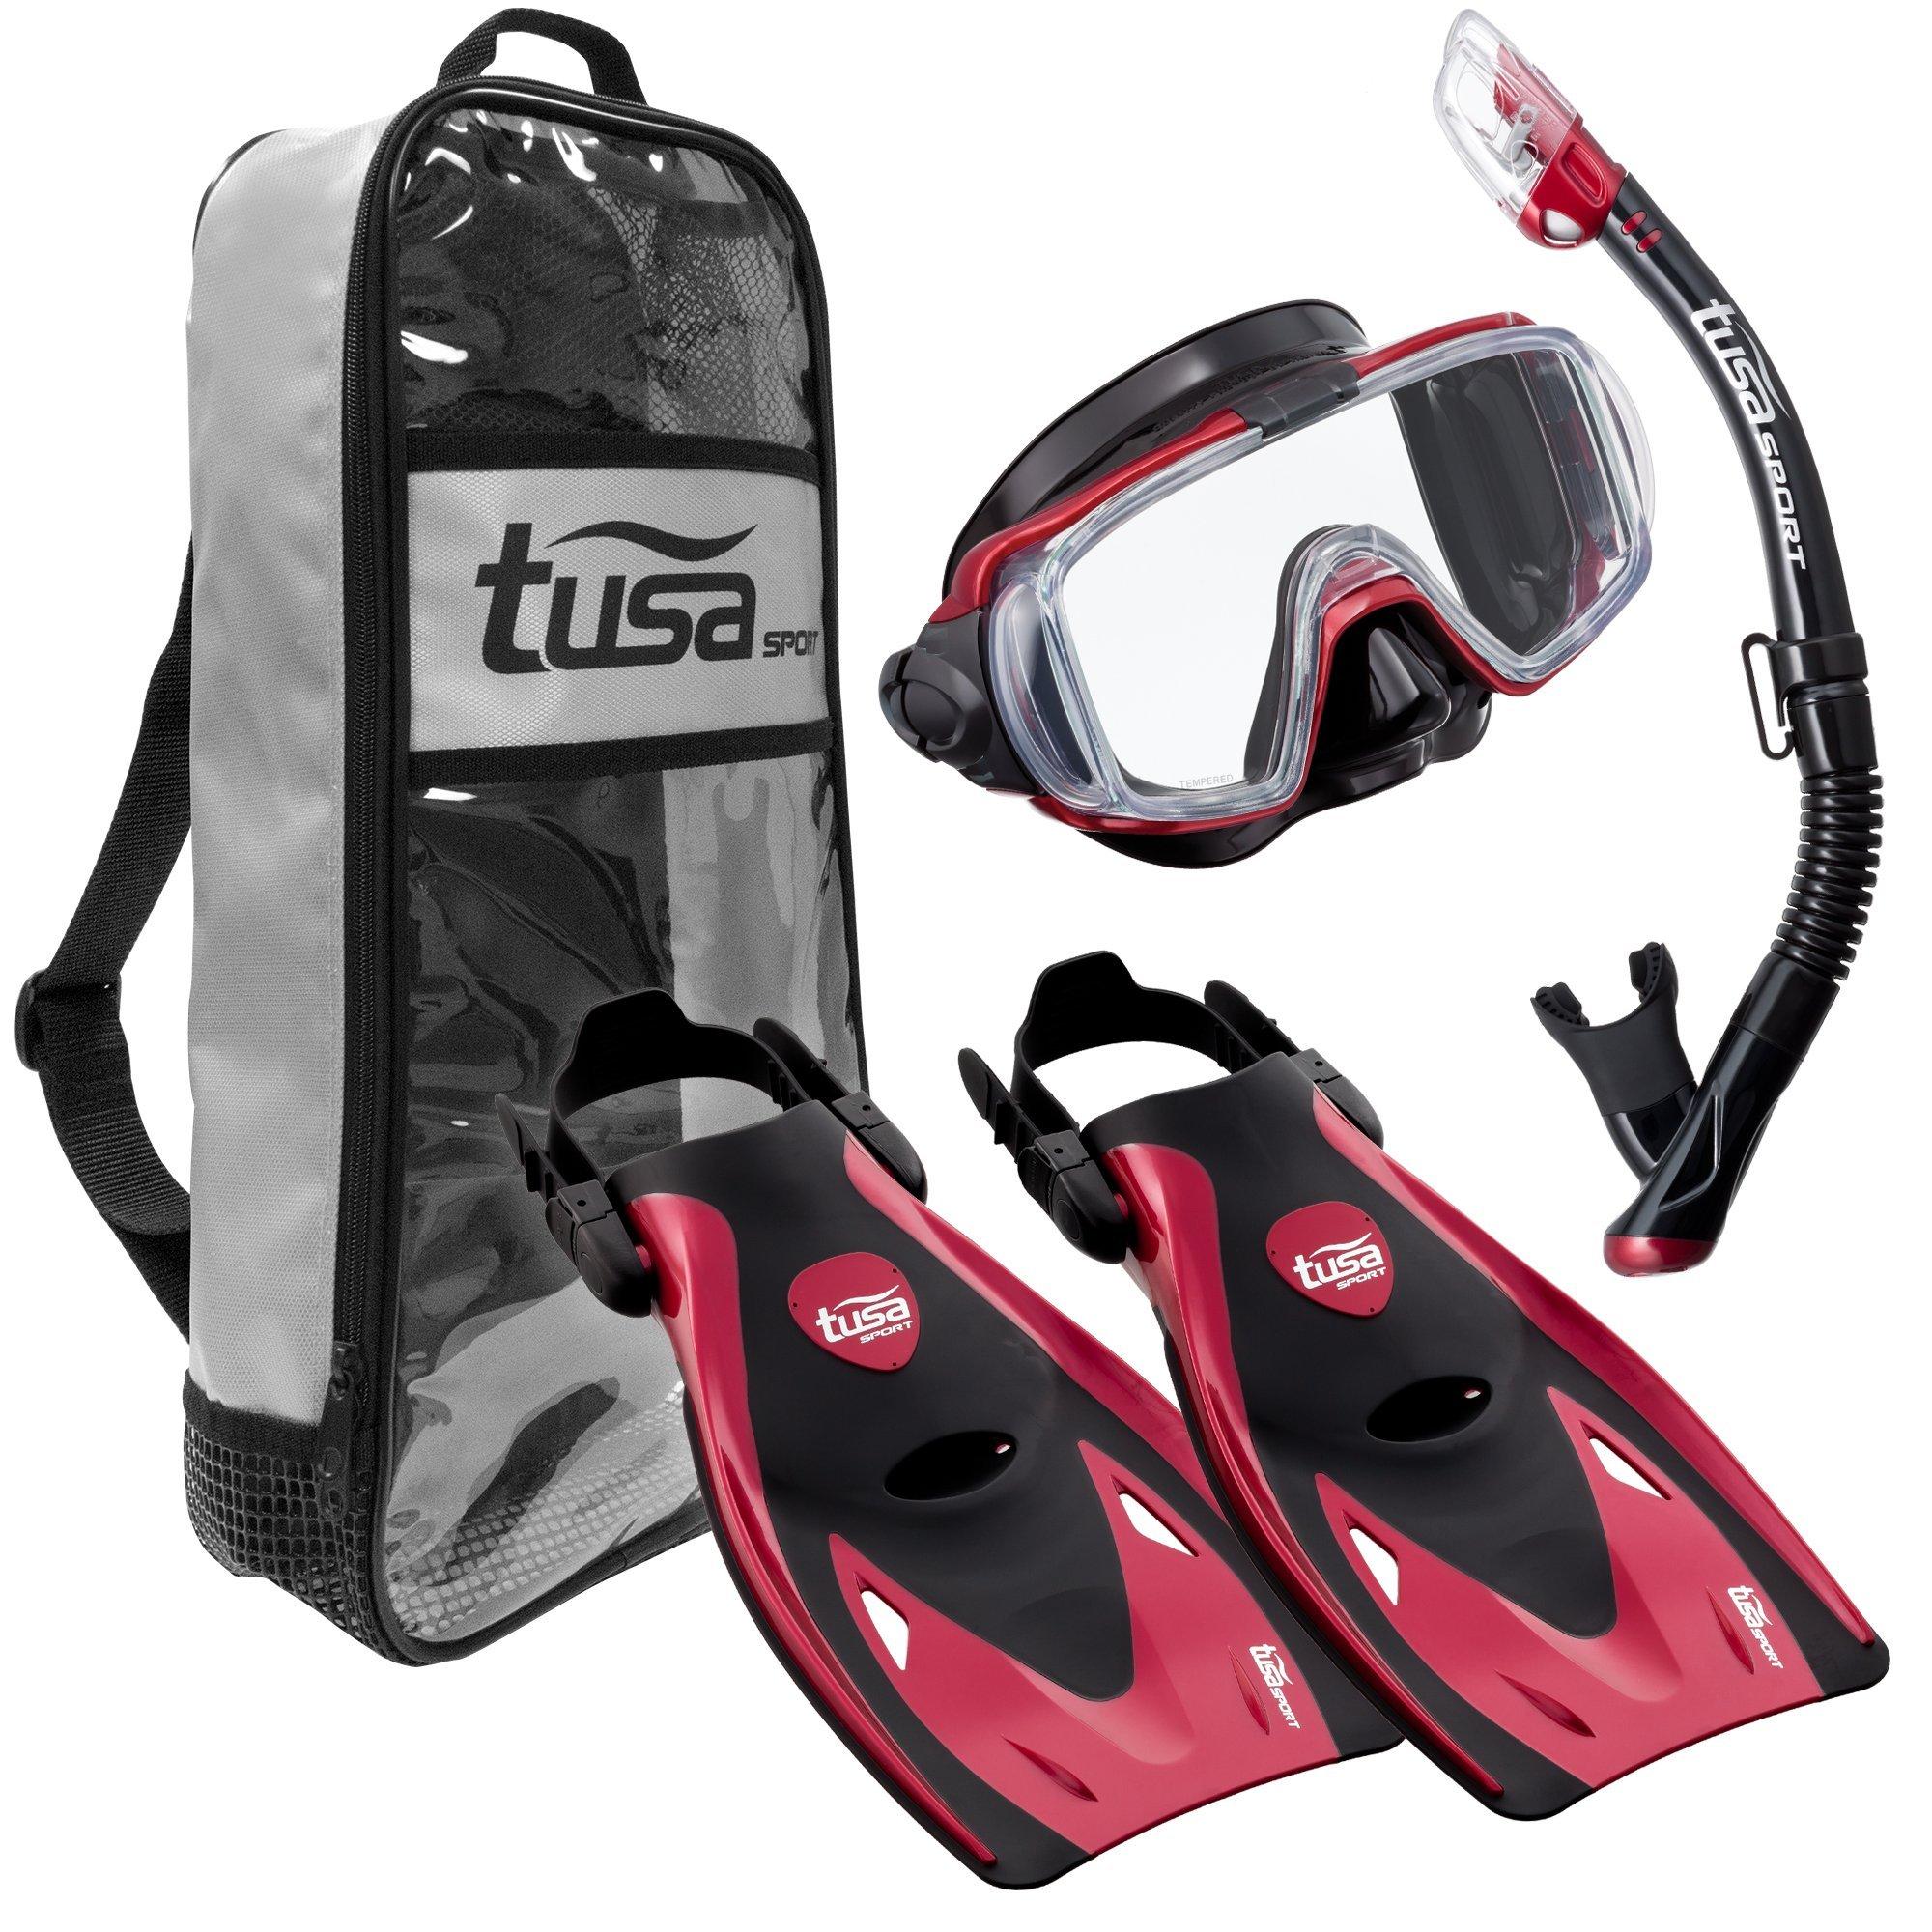 TUSA Sport Adult Black Series Visio Tri-Ex Mask, Dry Snorkel, and Fins Travel Set, Black/Metallic Red, Medium